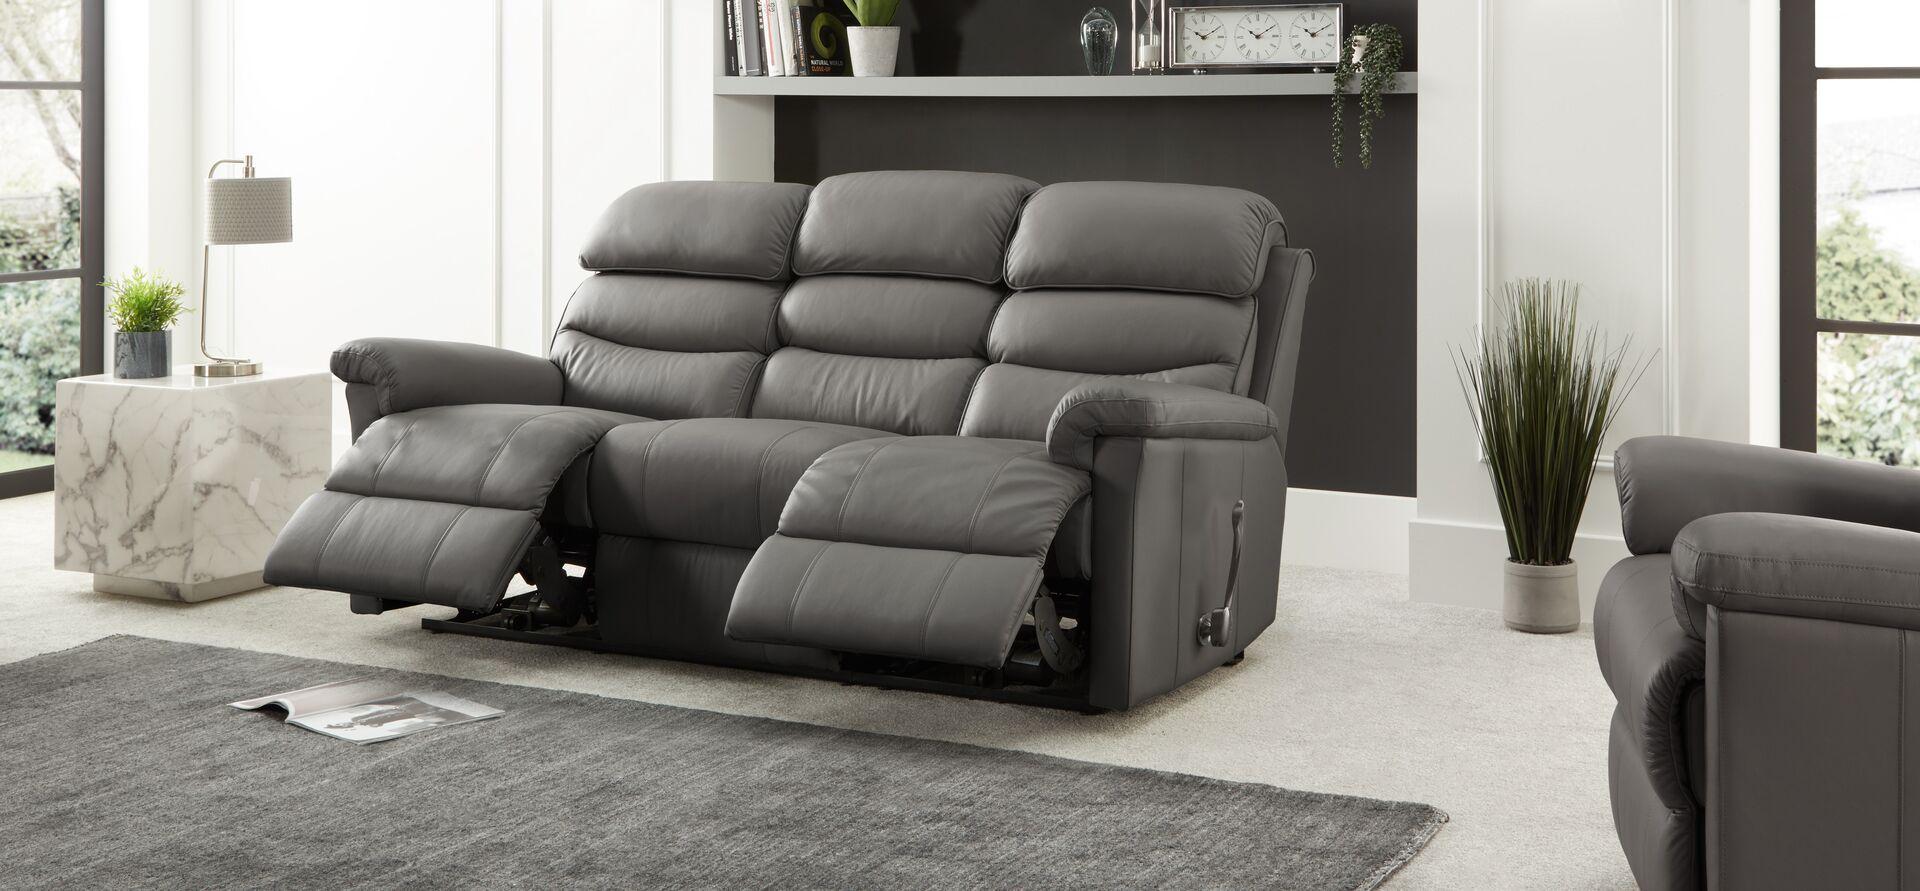 Excellent La Z Boy Tulsa 3 Seater Manual Recliner Sofa In 2019 Inzonedesignstudio Interior Chair Design Inzonedesignstudiocom